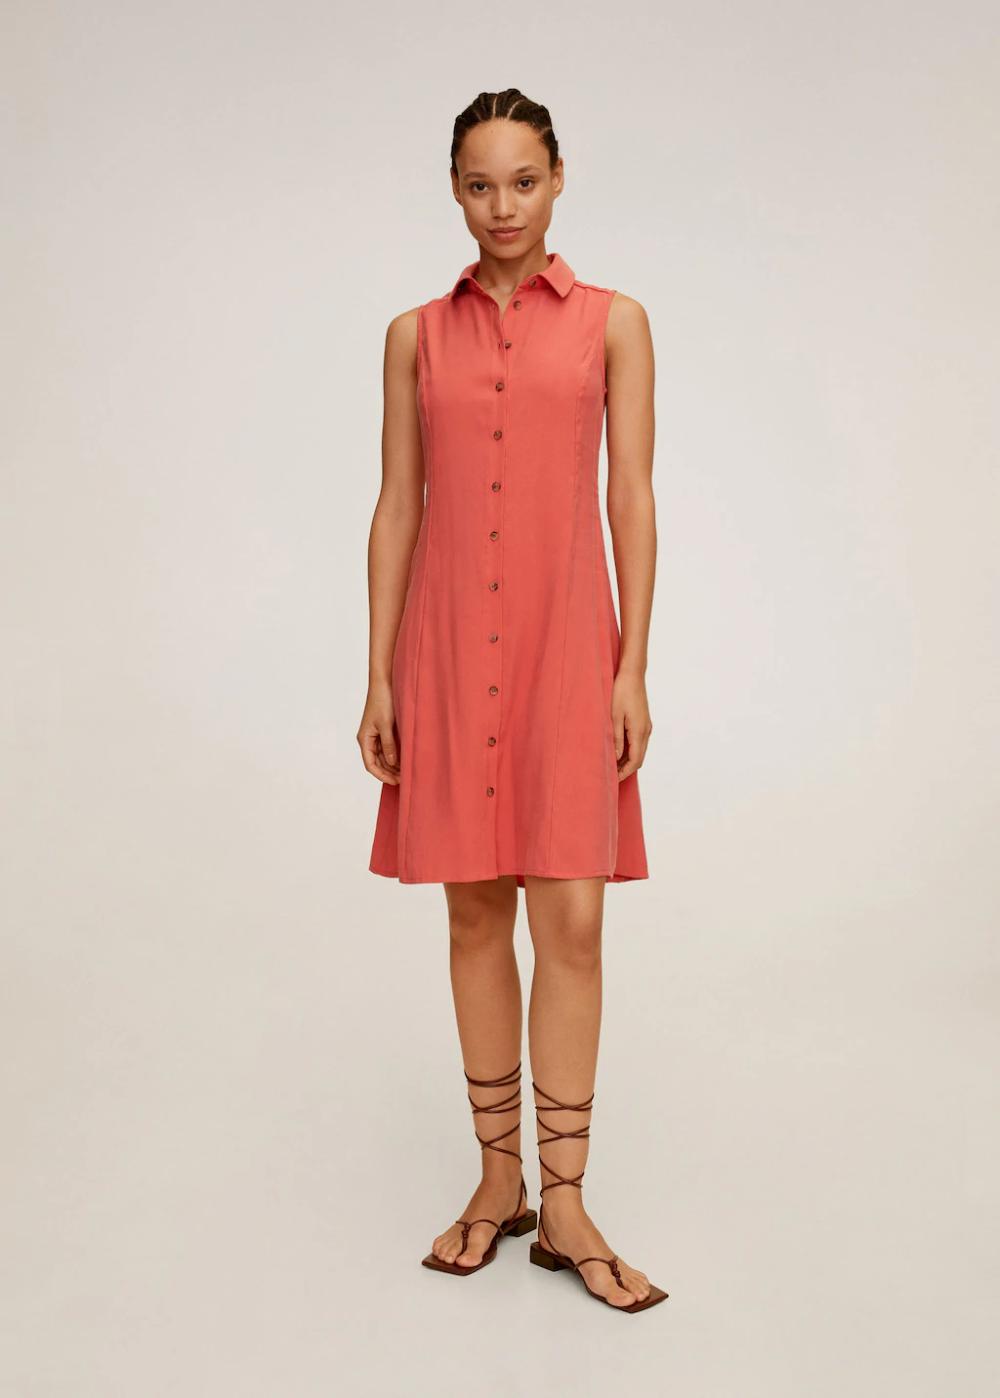 Dugmeli Gomlek Elbise Kadin Mango Turkiye 2020 Gomlek Elbise Elbise The Dress